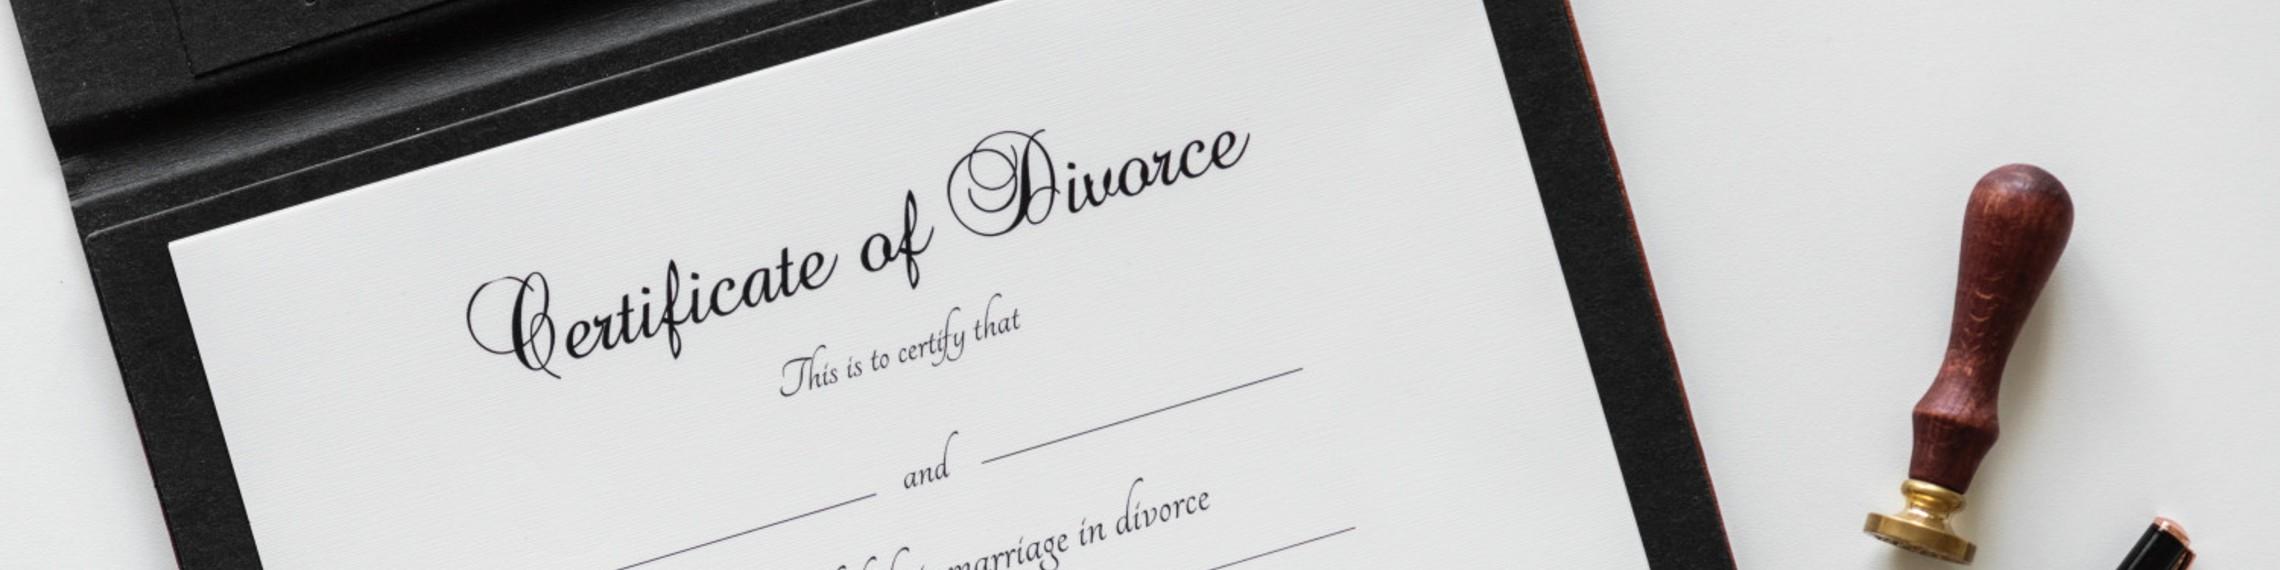 Certificate of Divorce image